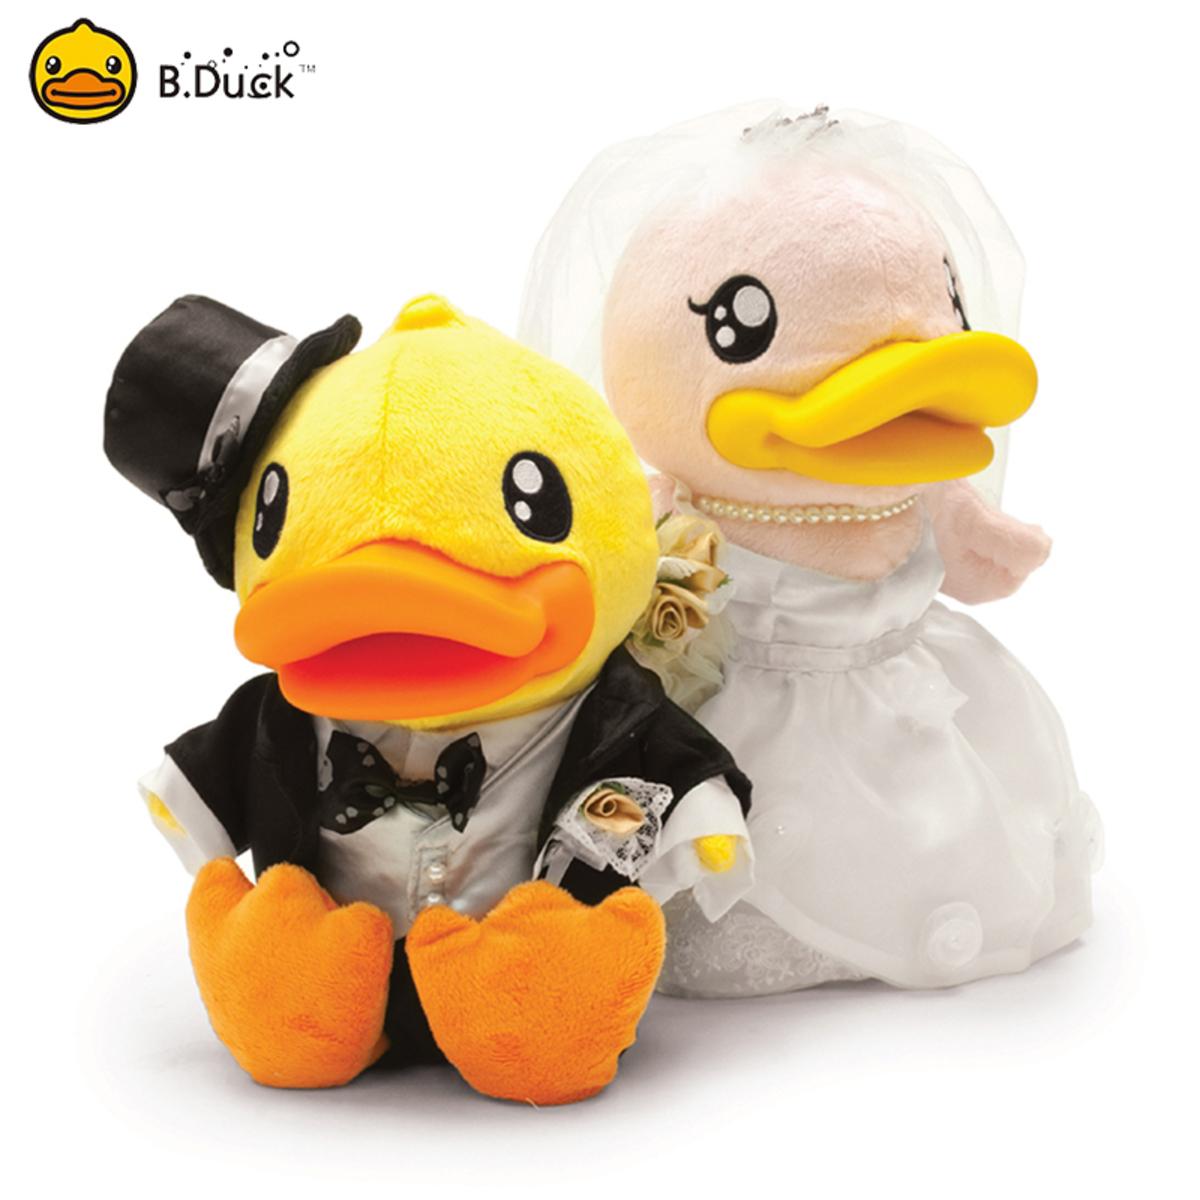 B.Duck 鴨仔結婚公仔 23cm Plush